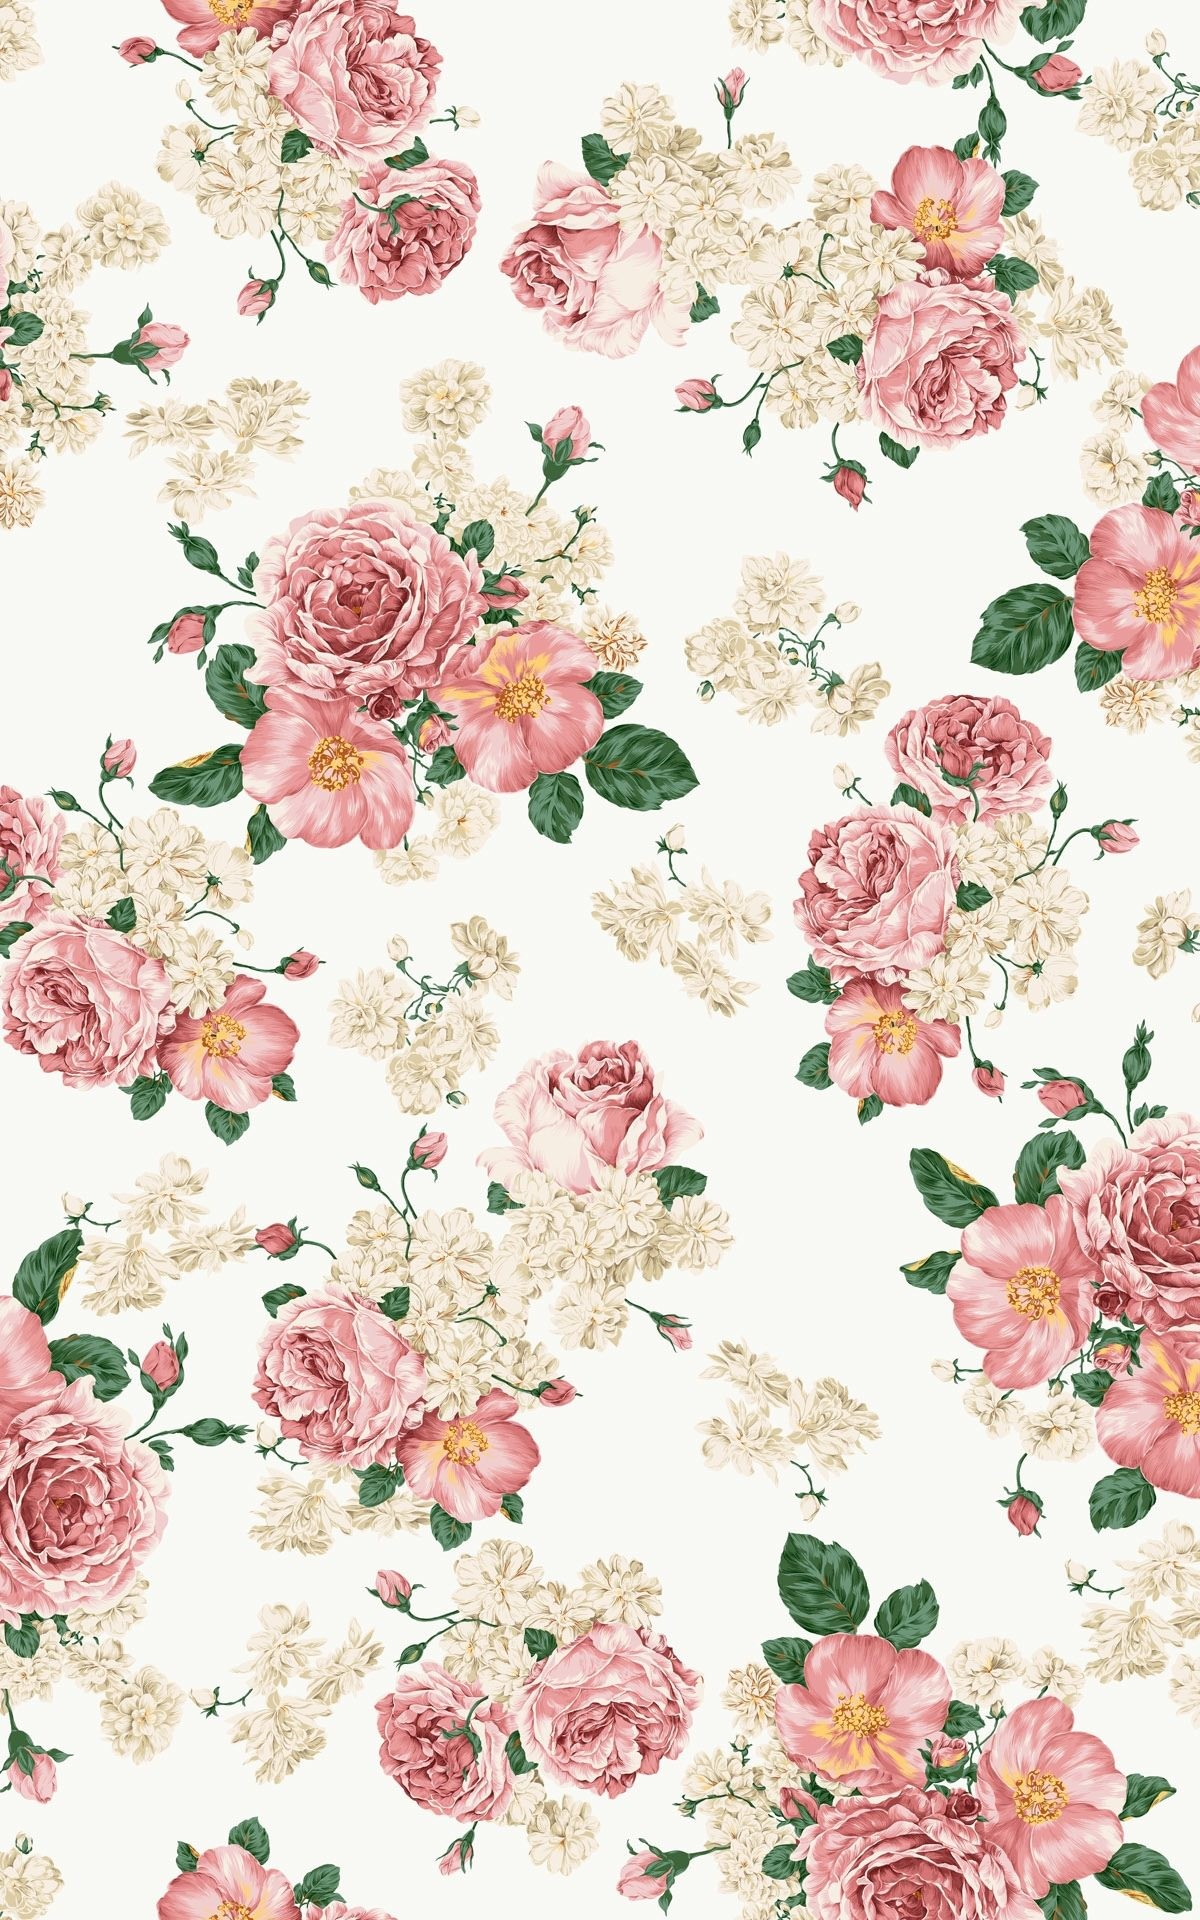 Antique Flower Wallpaper 50 Images